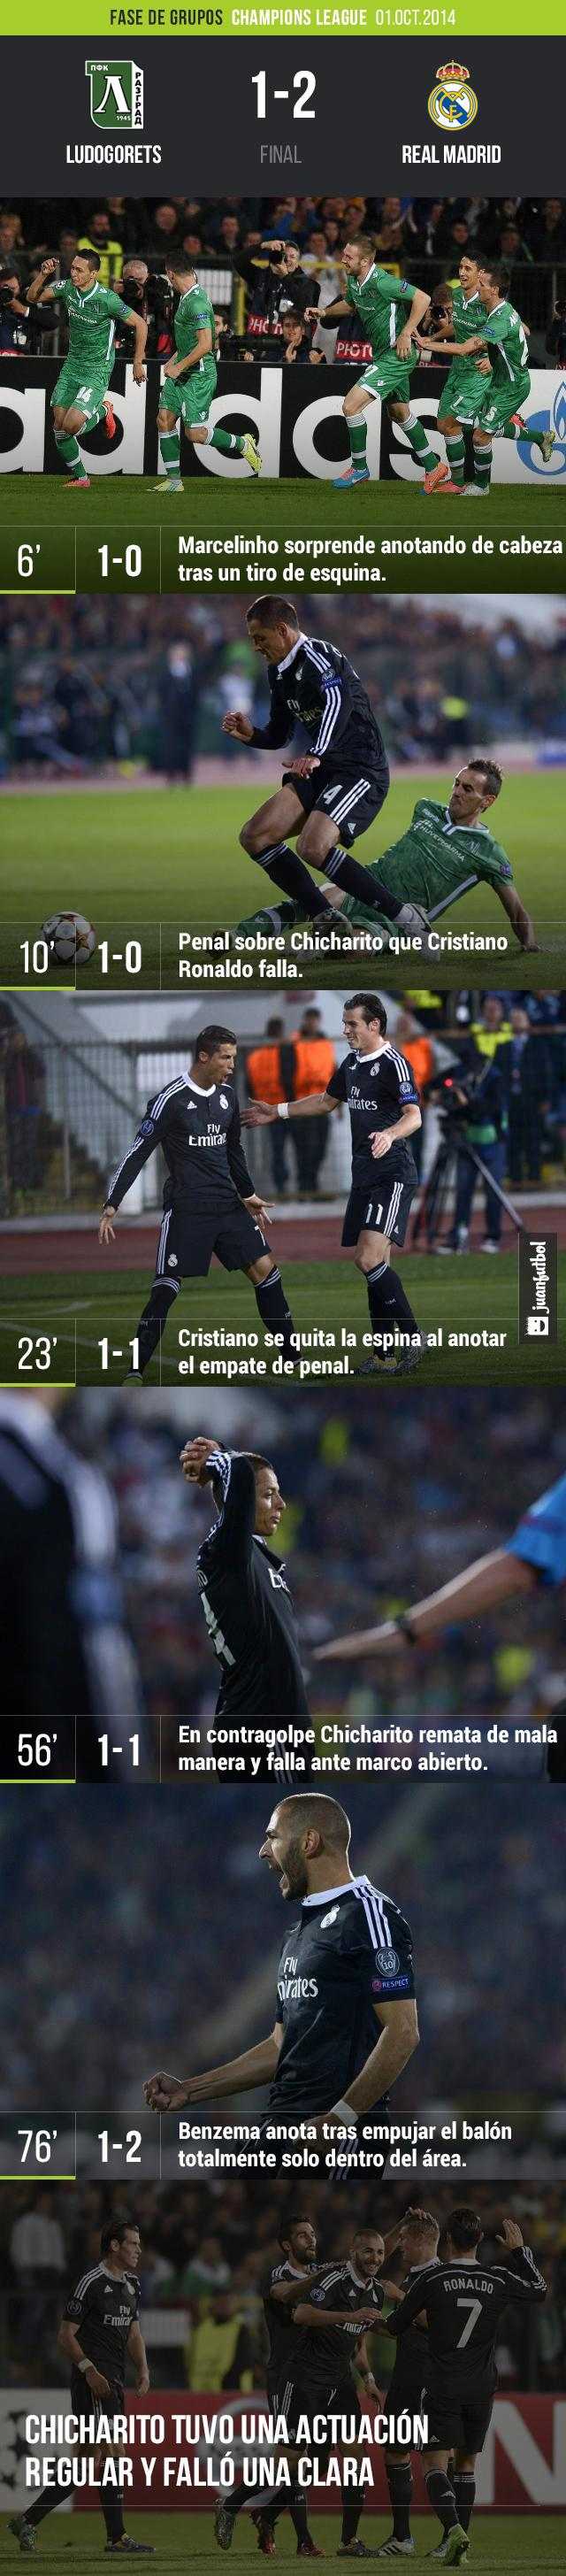 Real Madrid batalló, pero al final se llevó los tres puntos